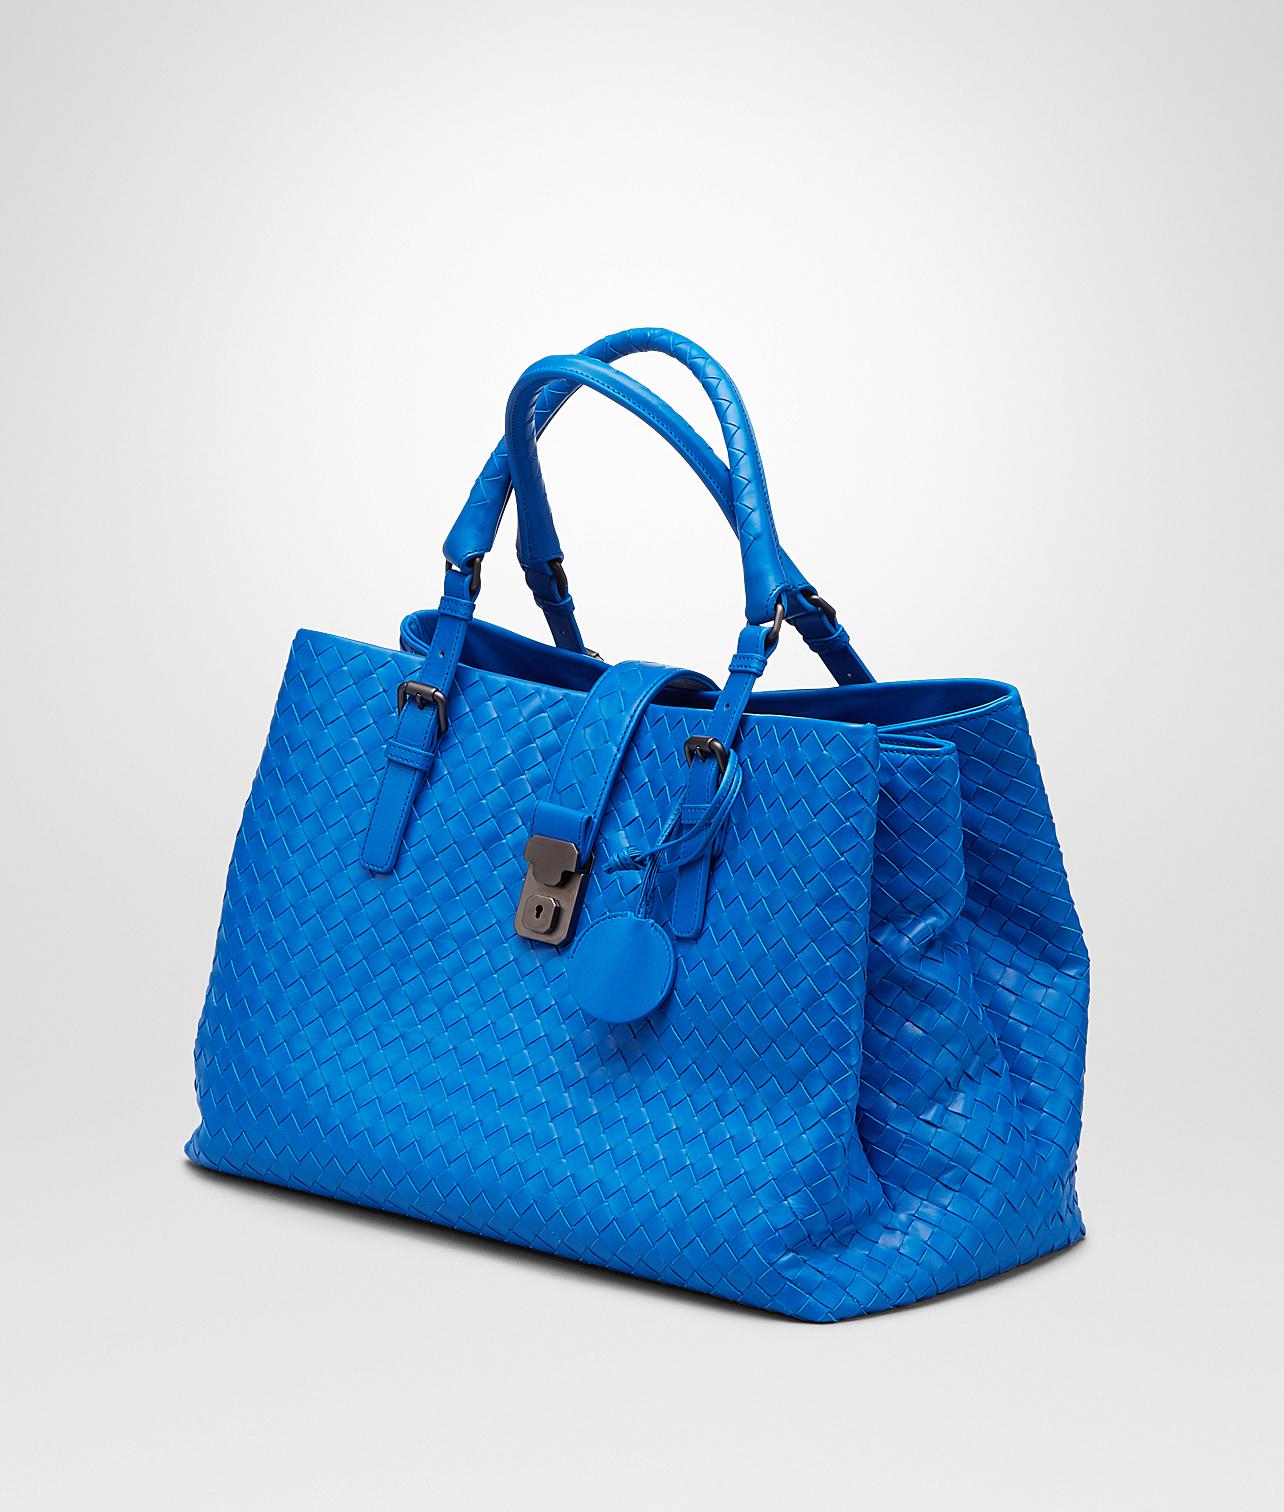 Lyst - Bottega Veneta Signal Blue Intrecciato Light Calf Roma Bag in ... 89d71c89e4fa6